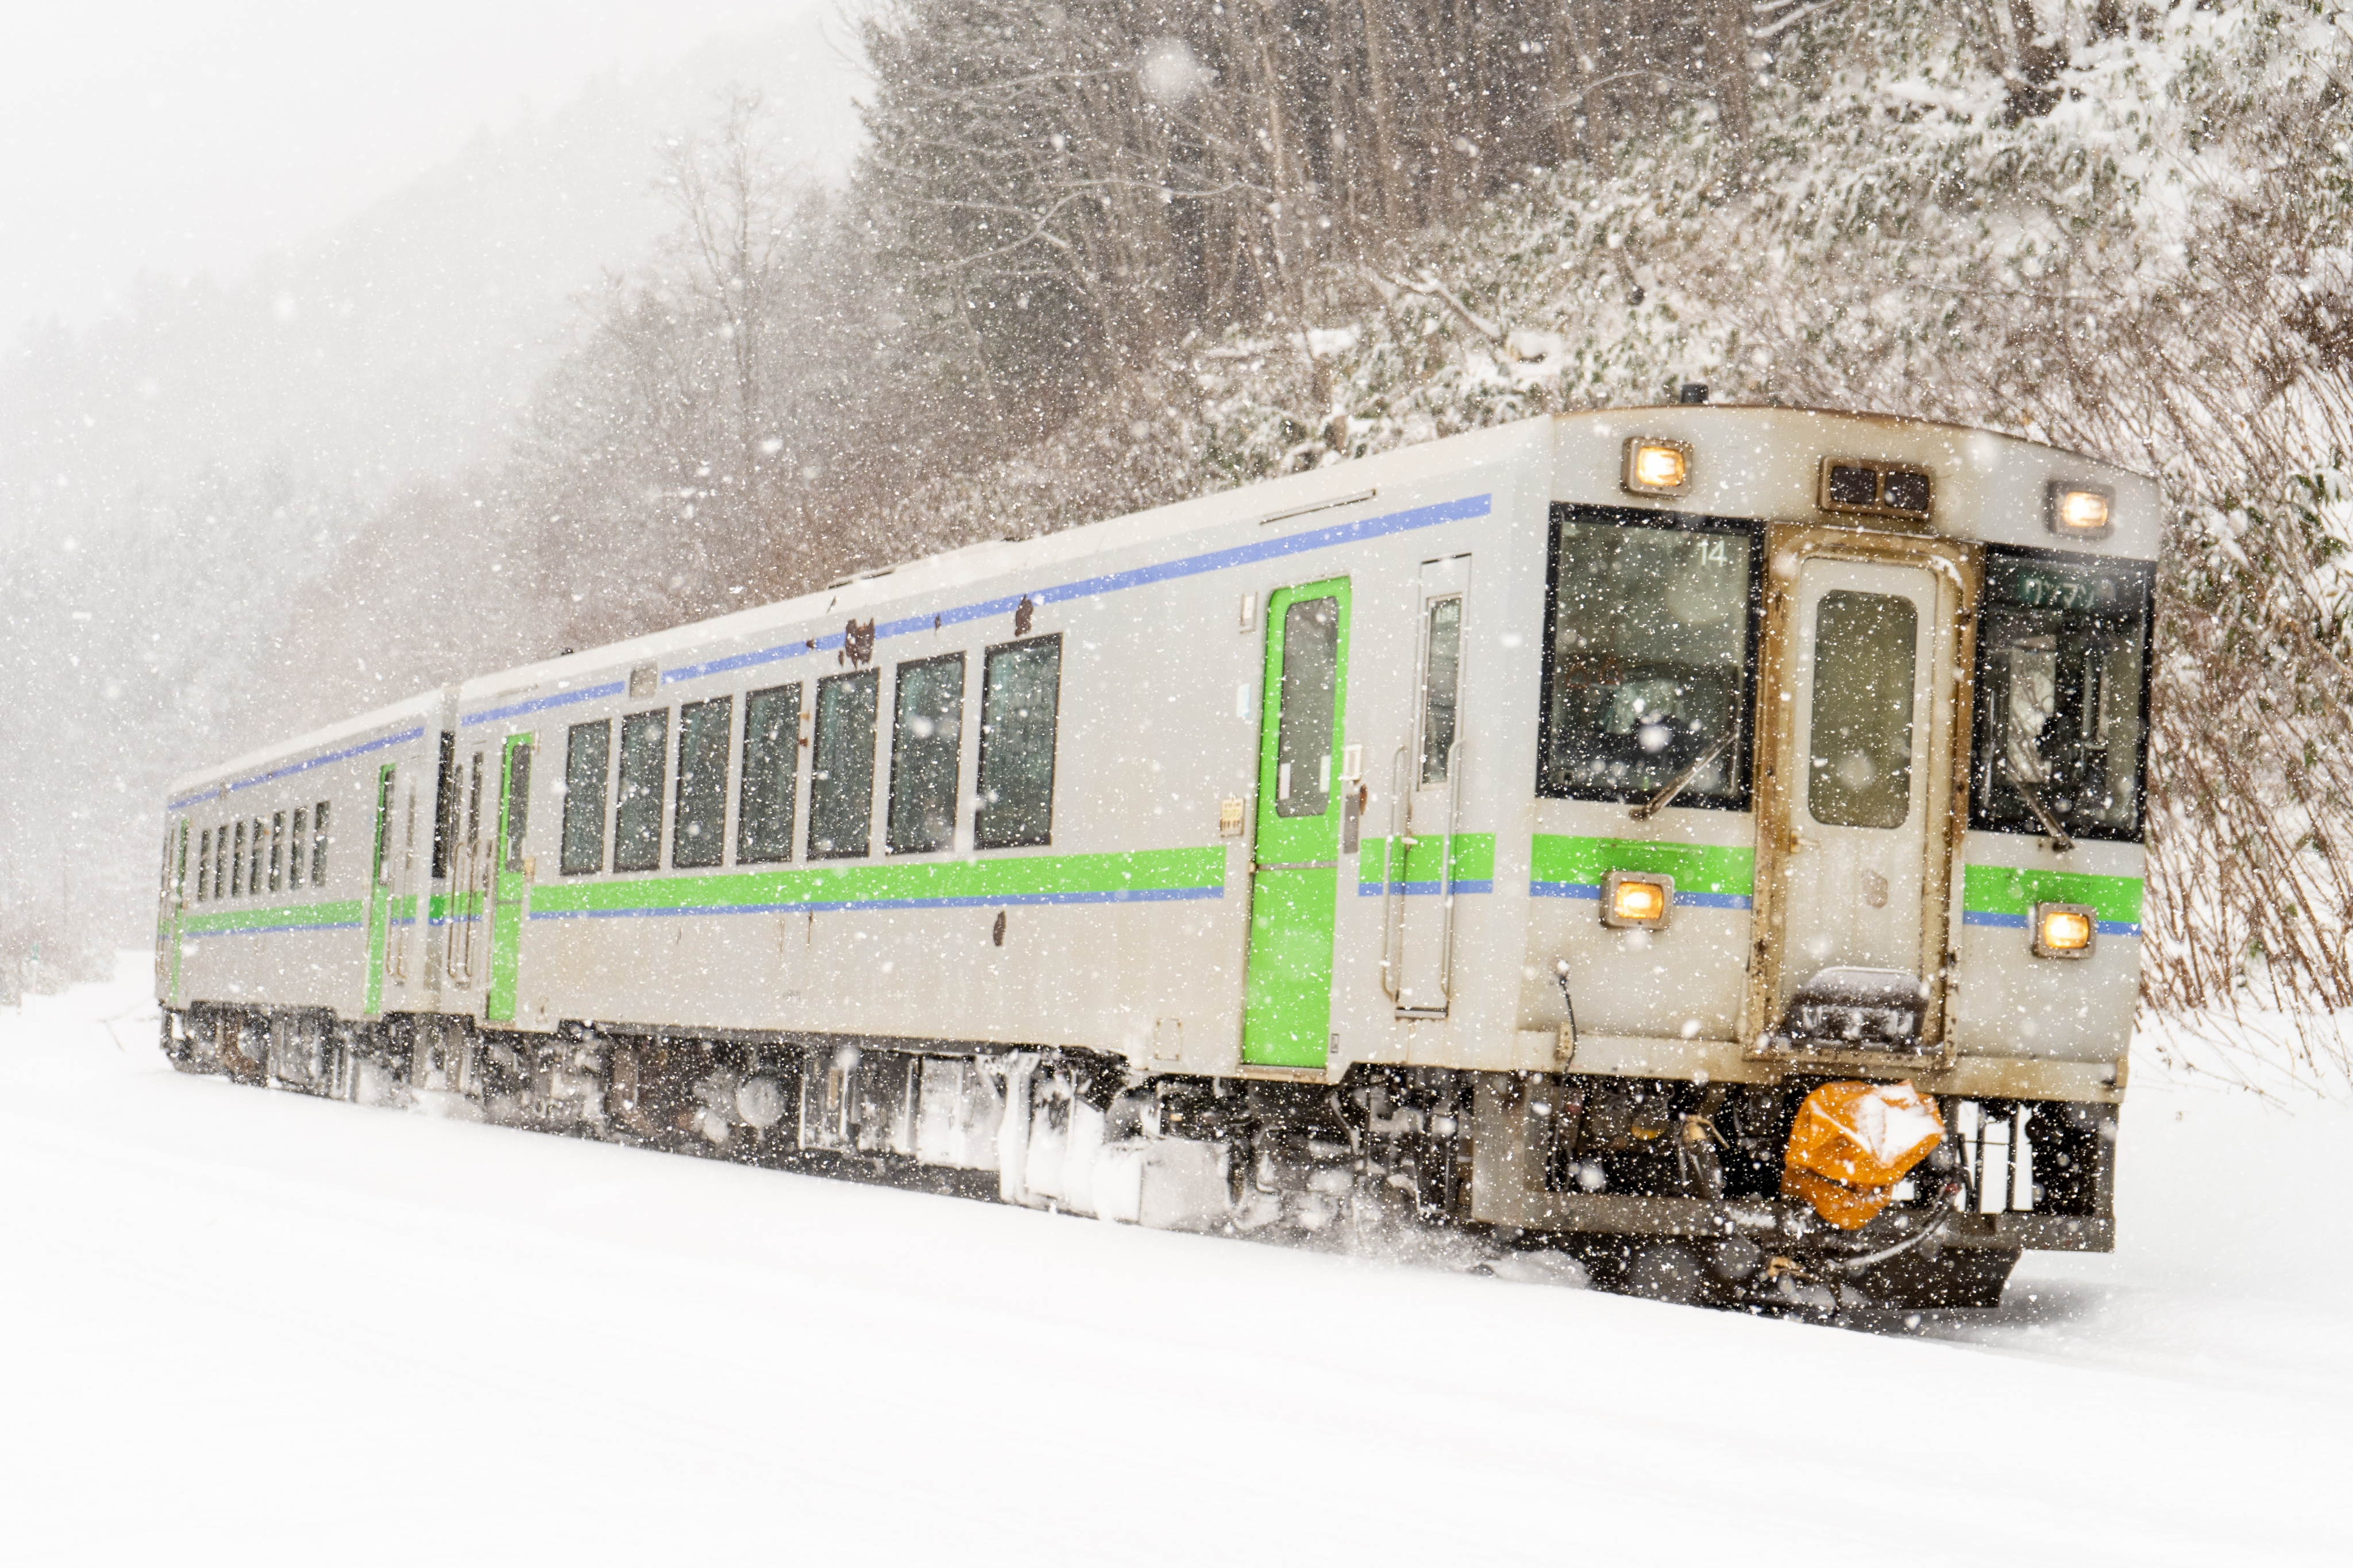 キハ150 1939D 銀山駅入線 200112.jpg